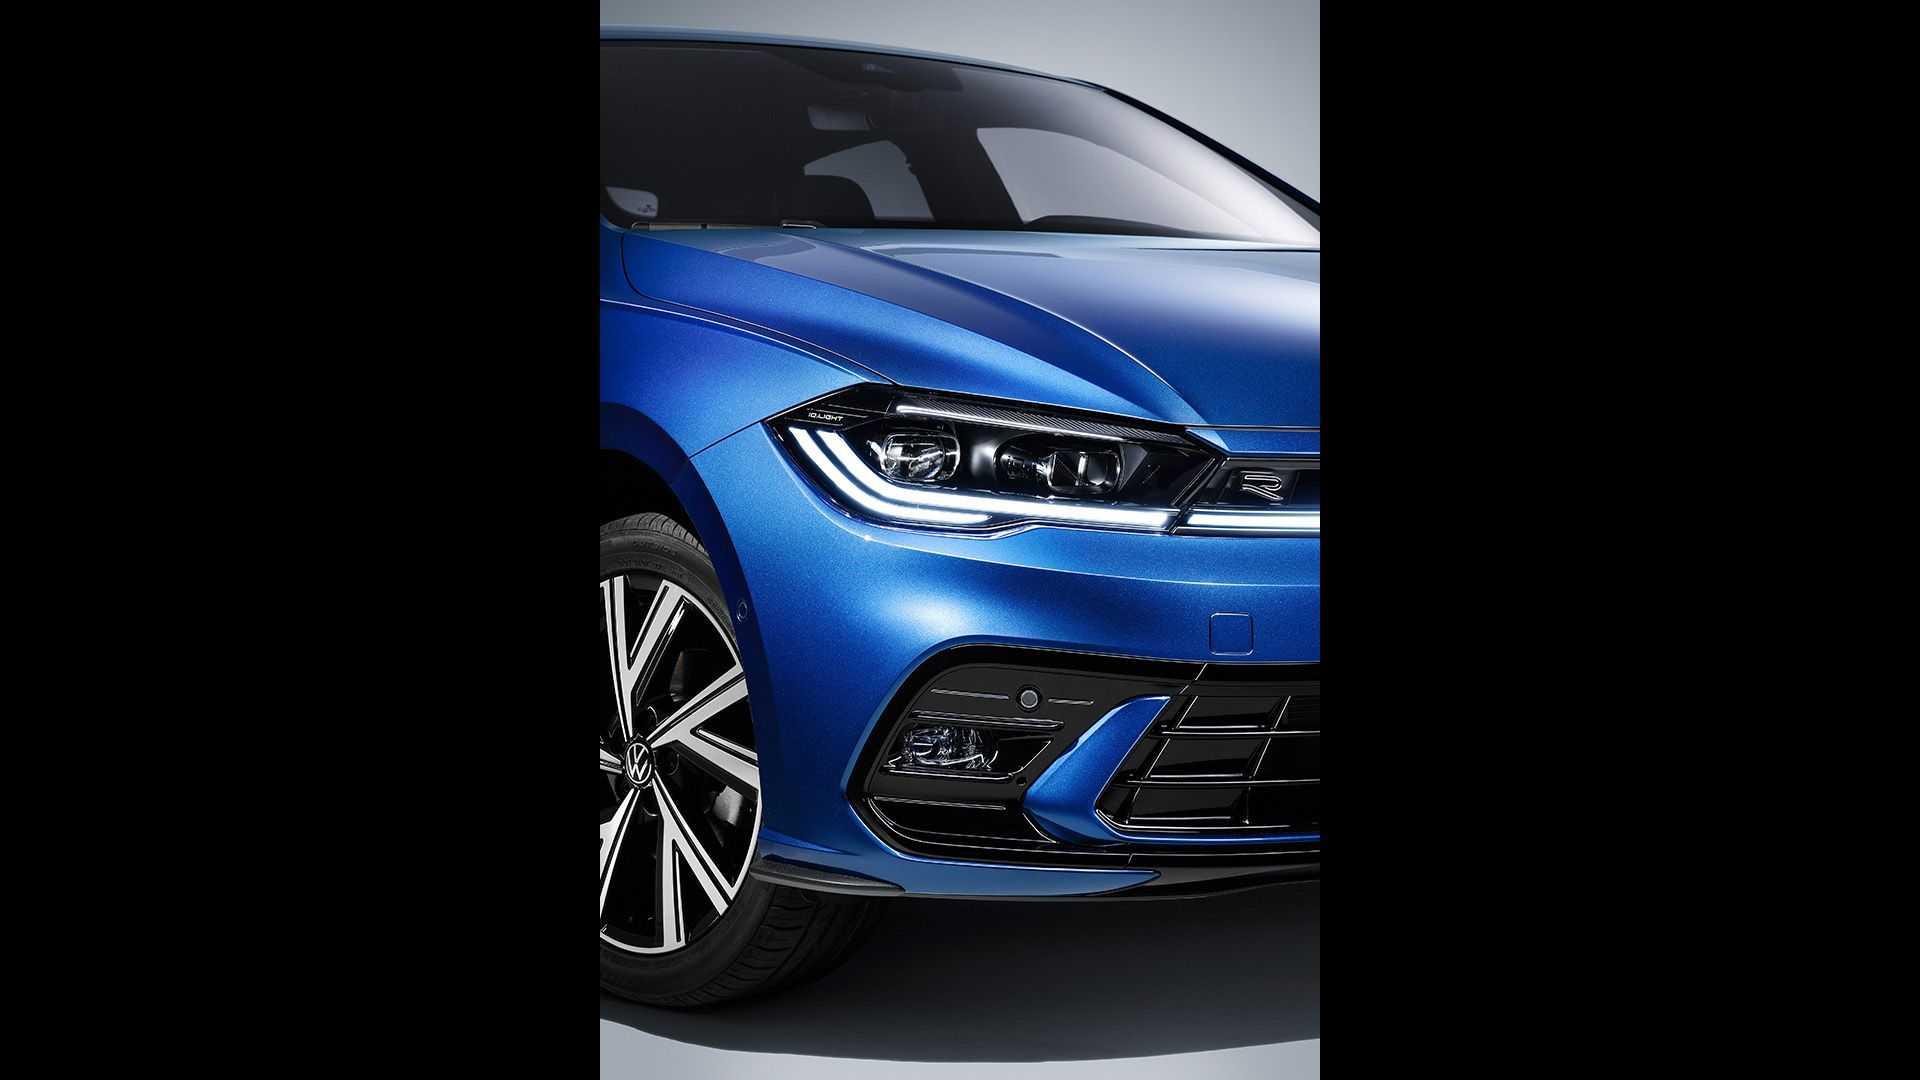 Volkswagen-Polo-facelift-12